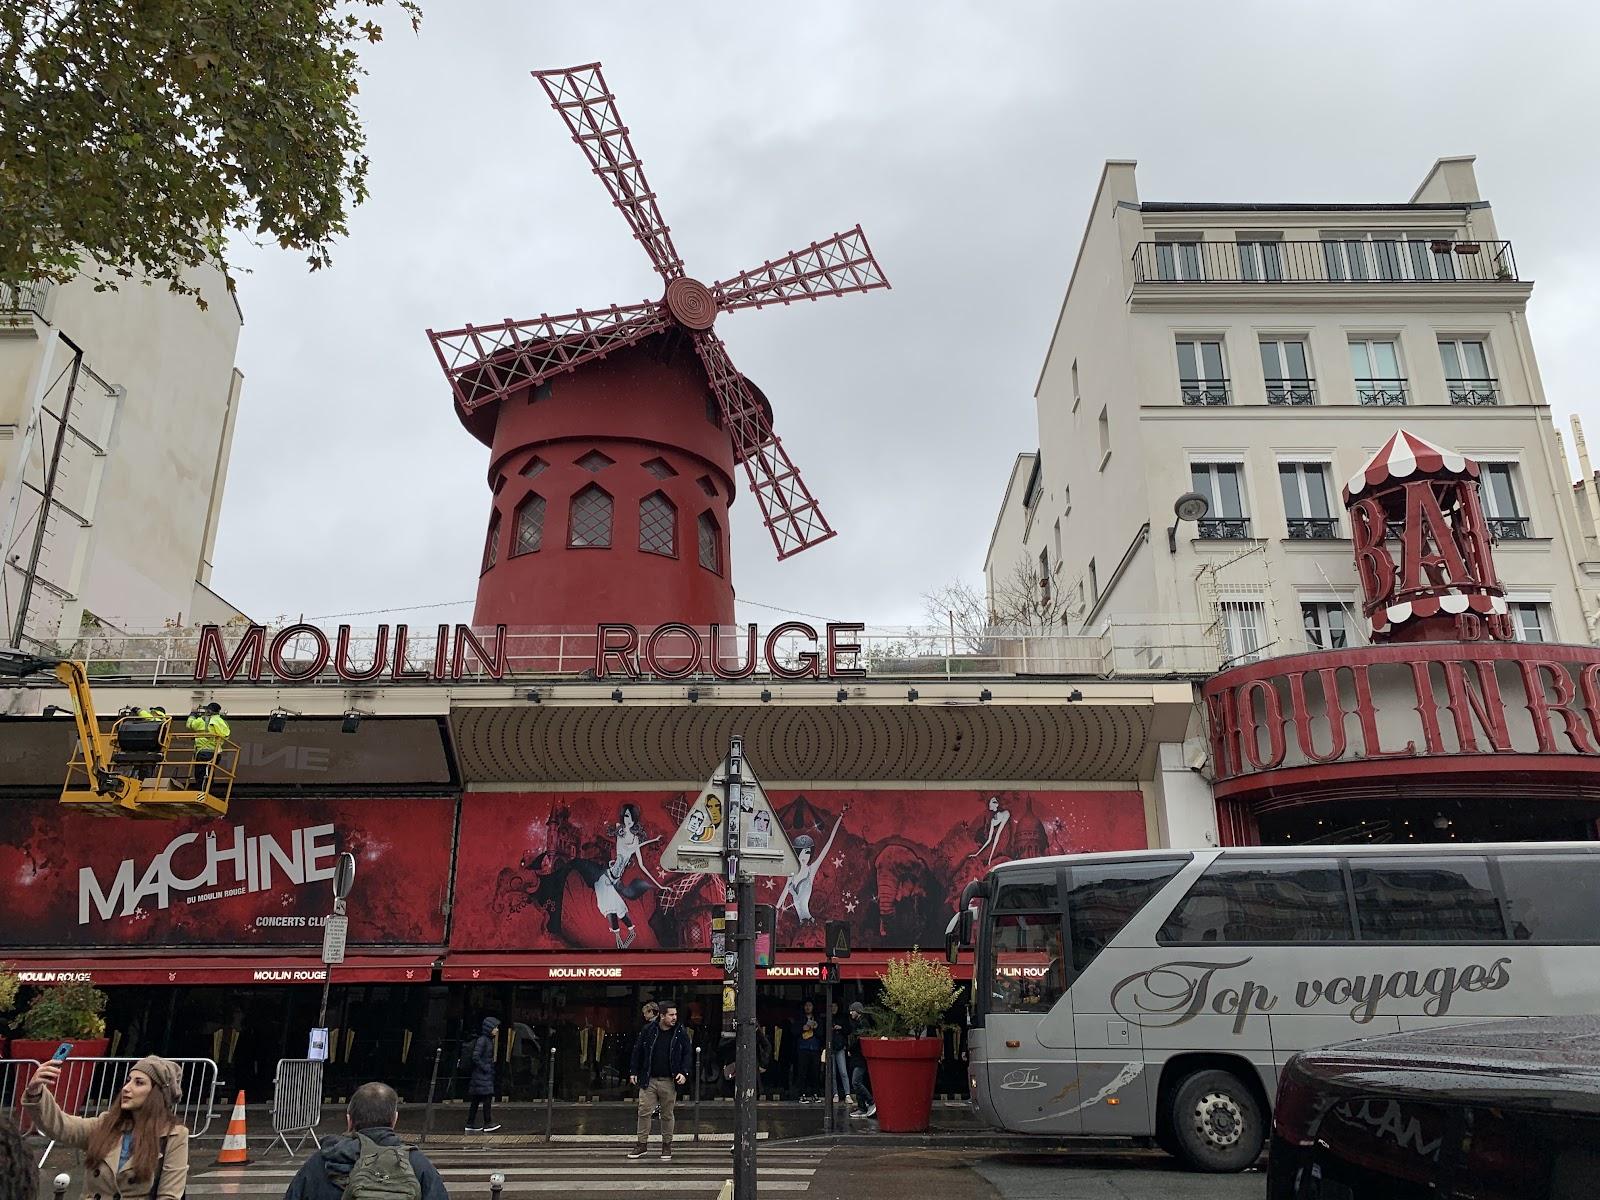 Montmartre - Moulin Rouge